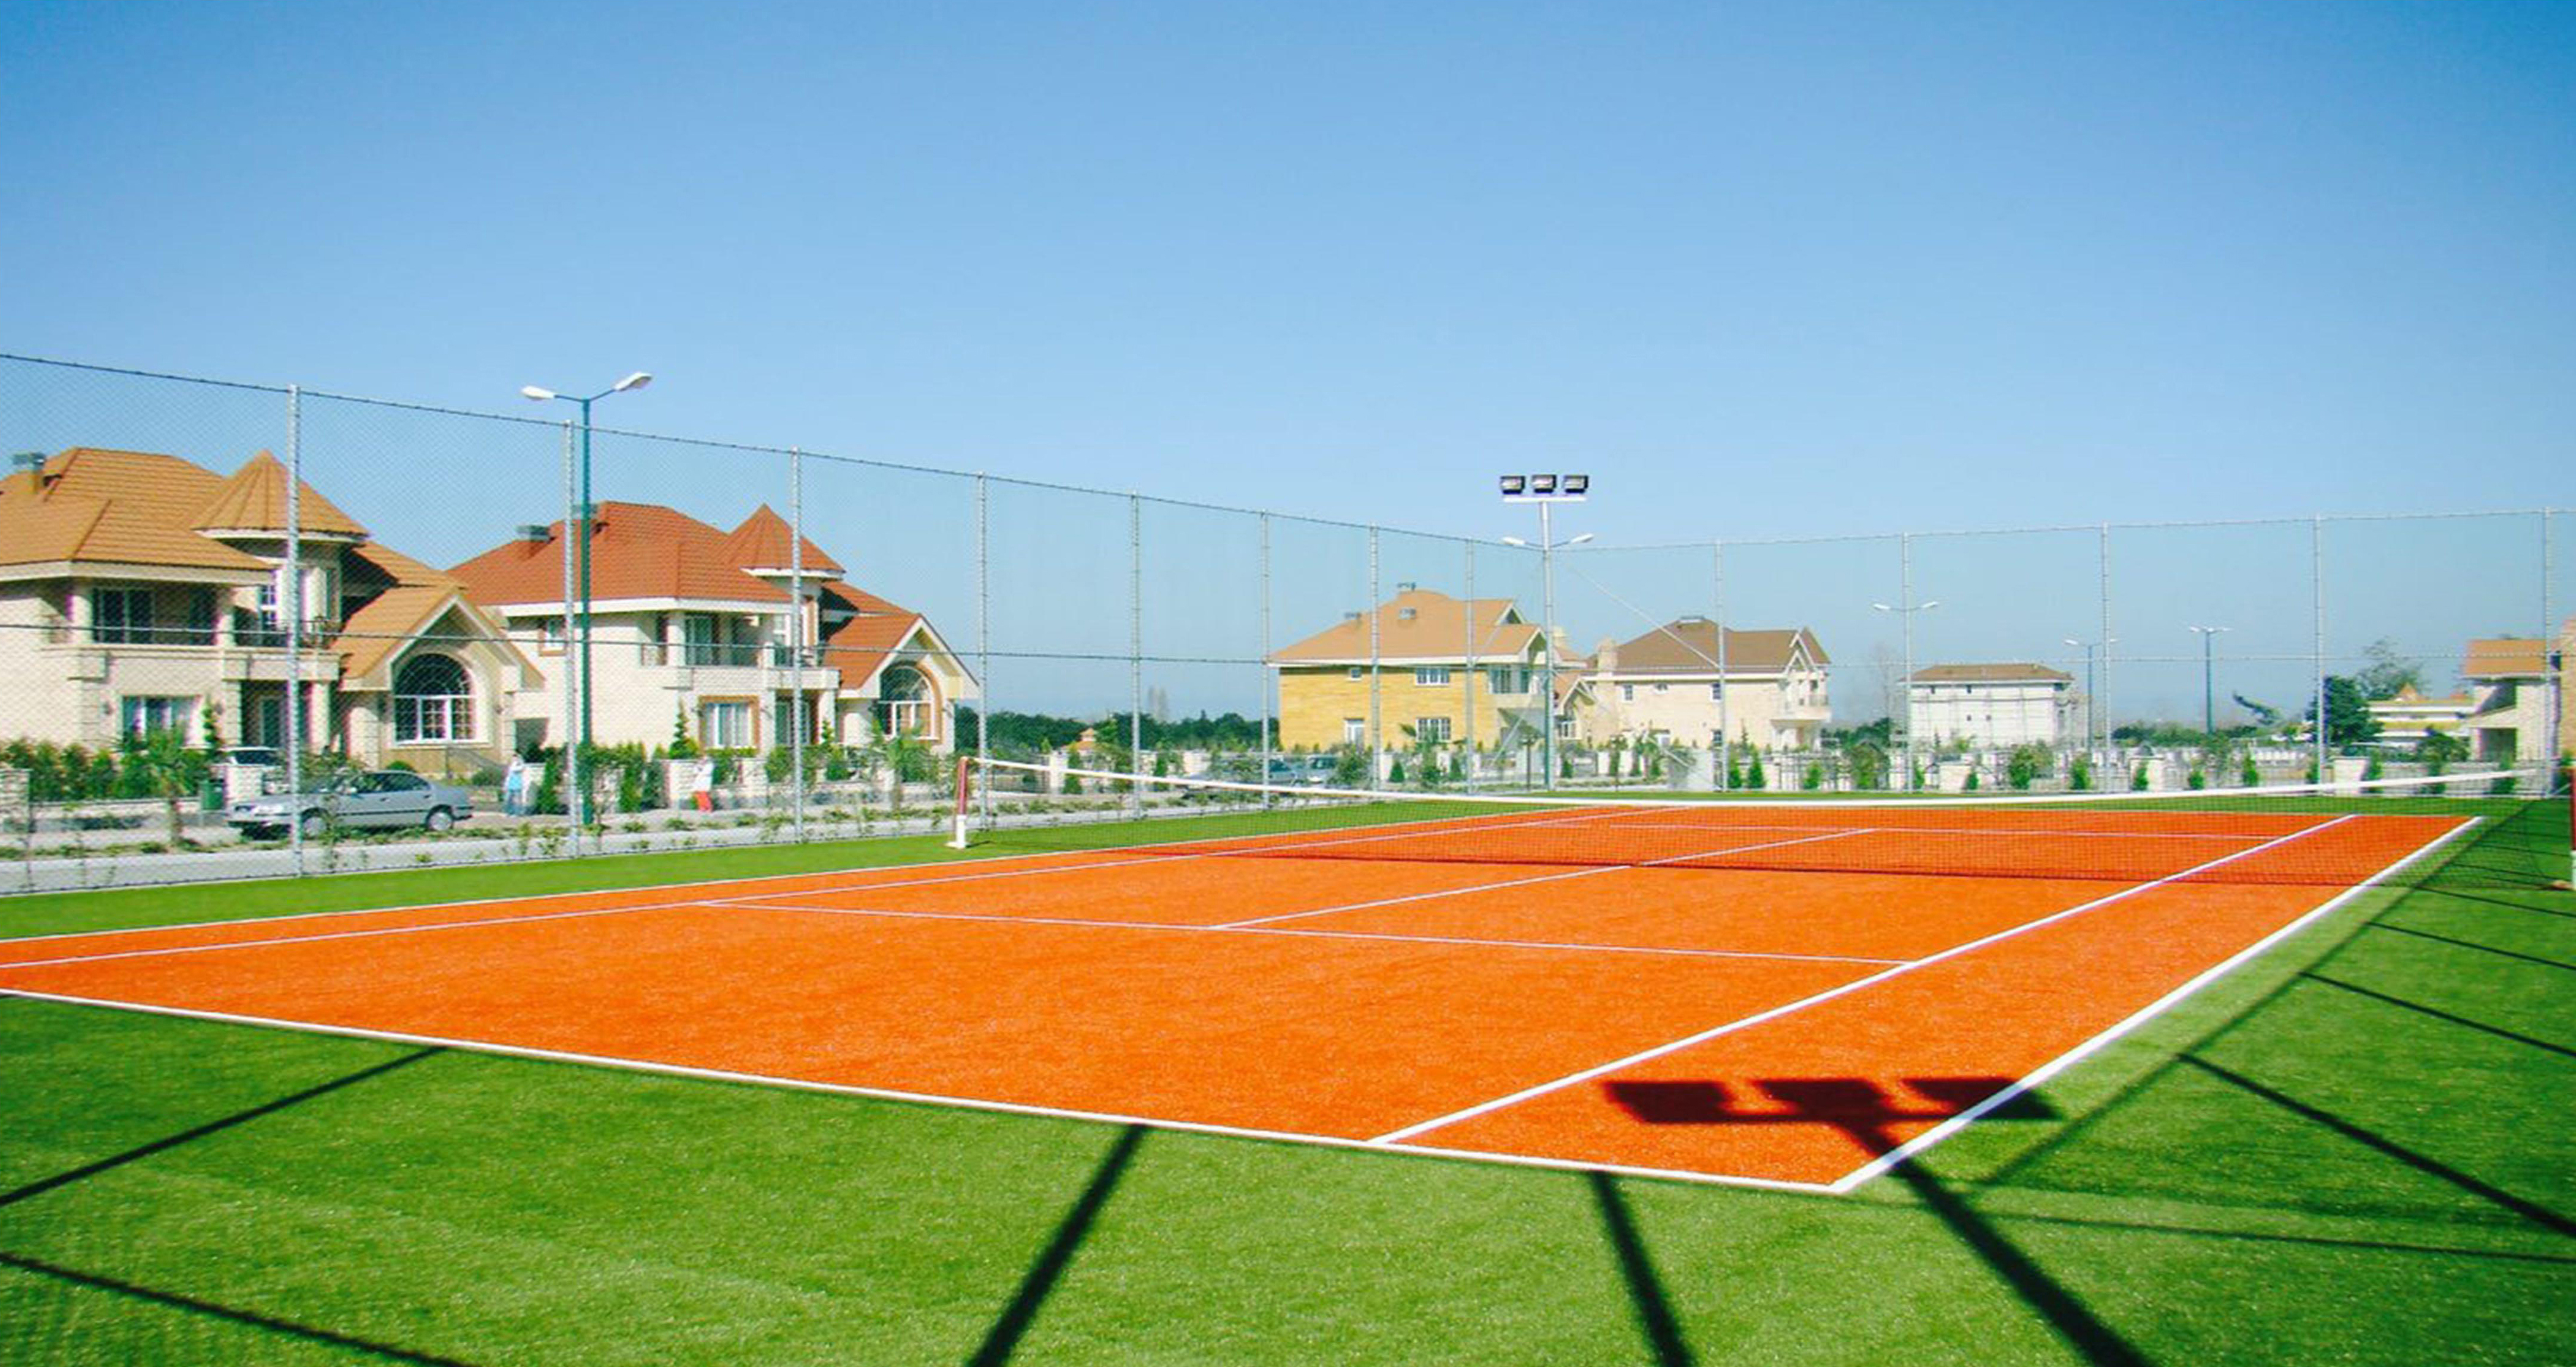 2-beka pro tennis xt pe-S